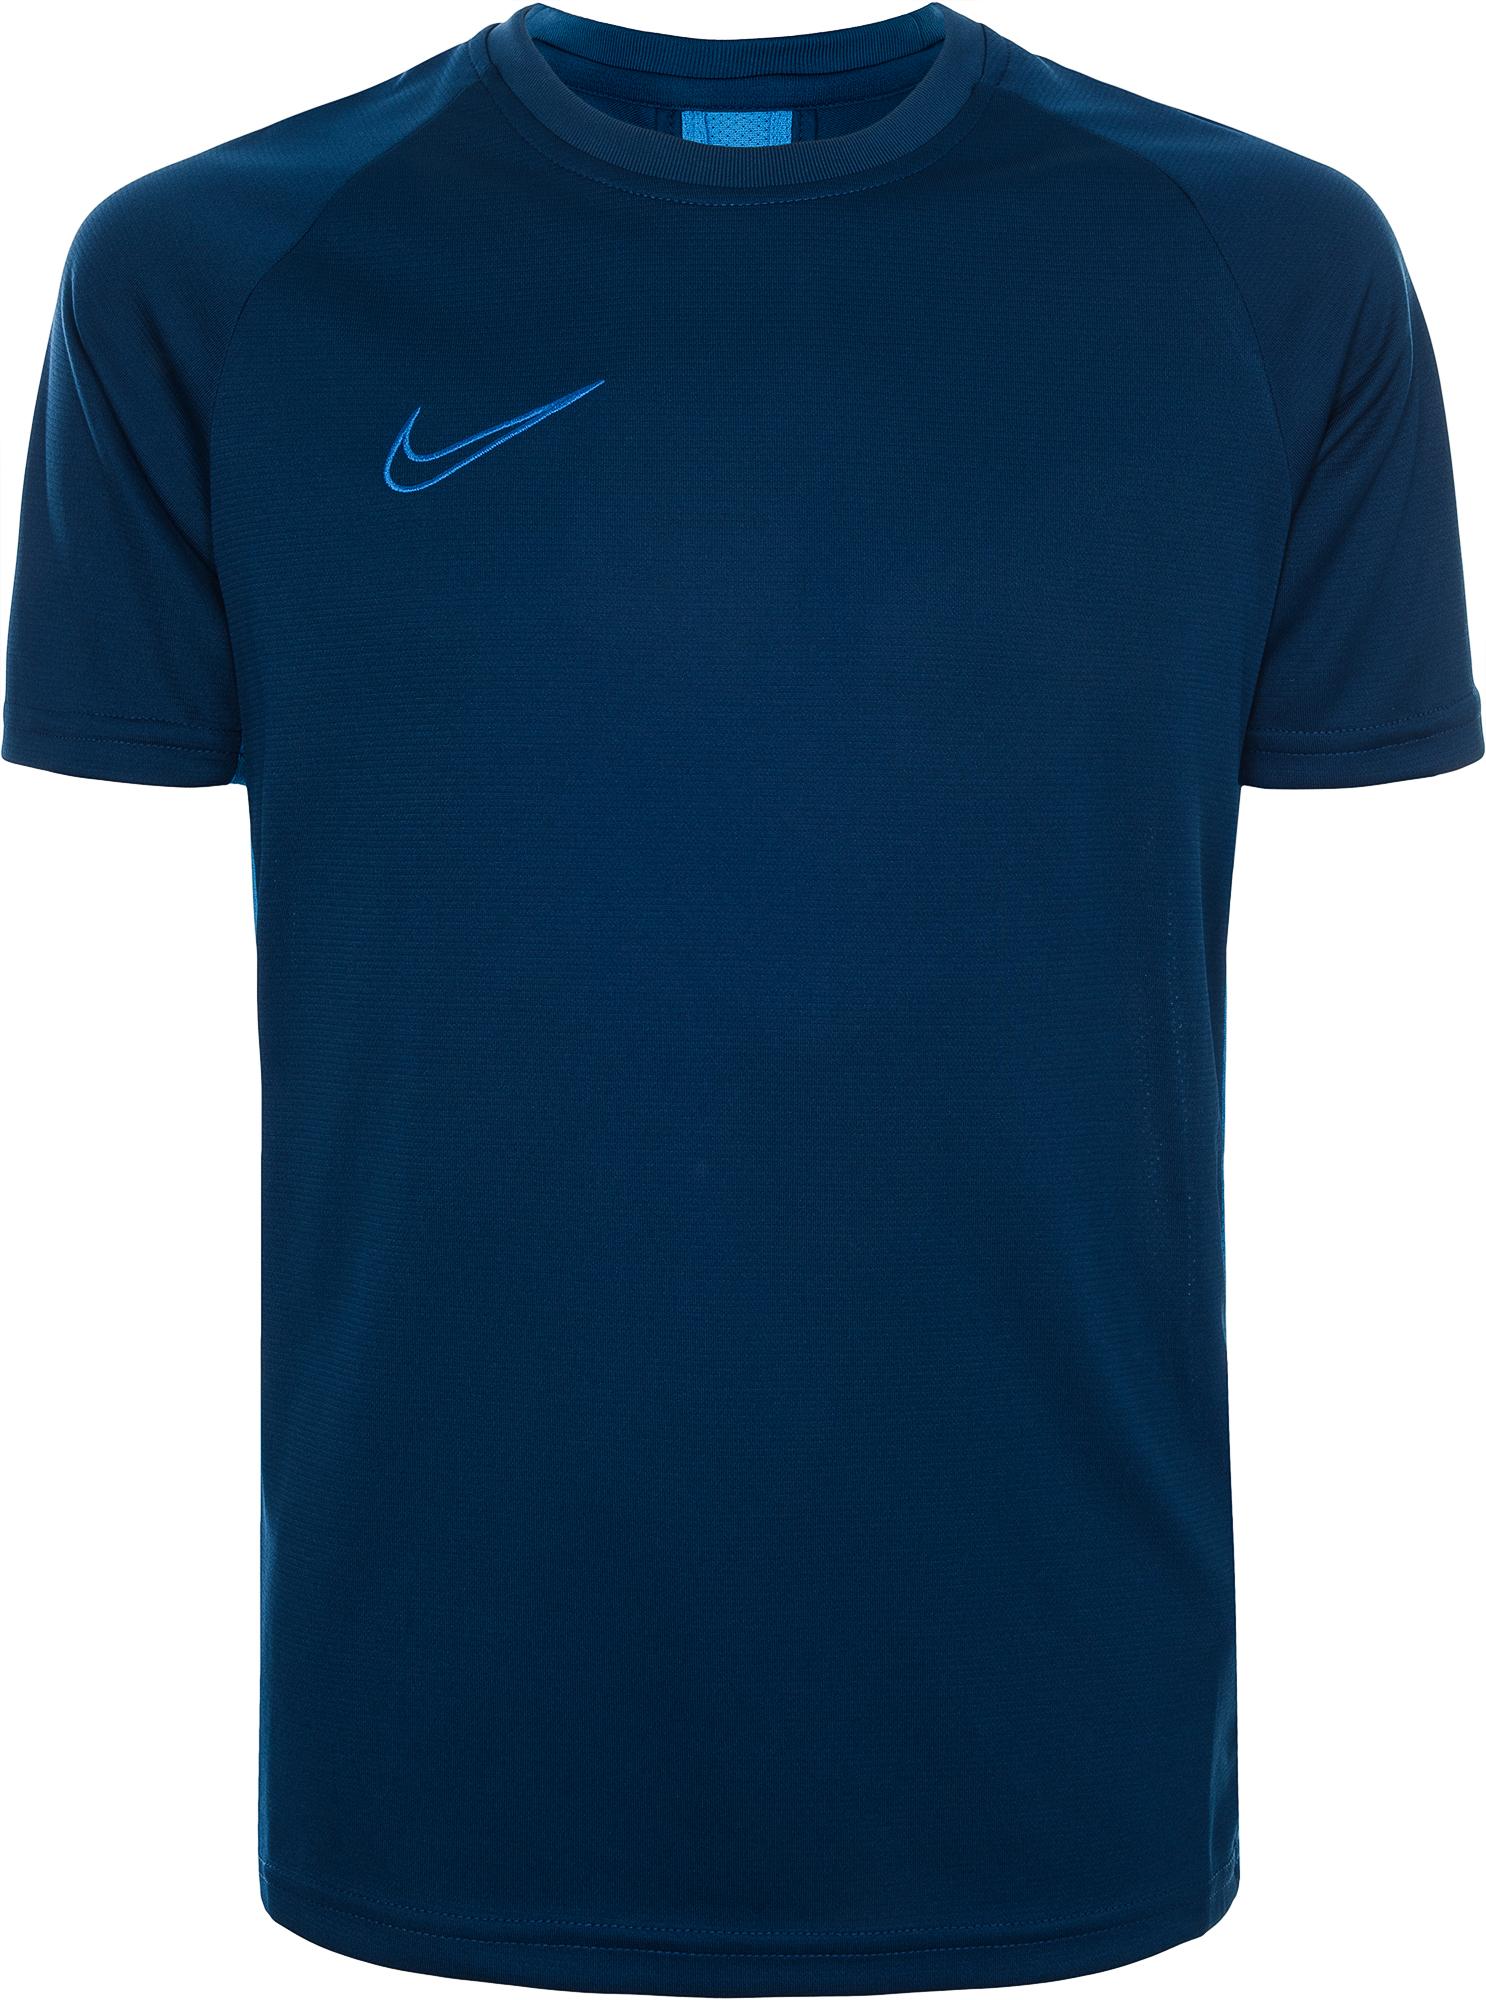 Nike Футболка для мальчиков Dry Academy, размер 147-158